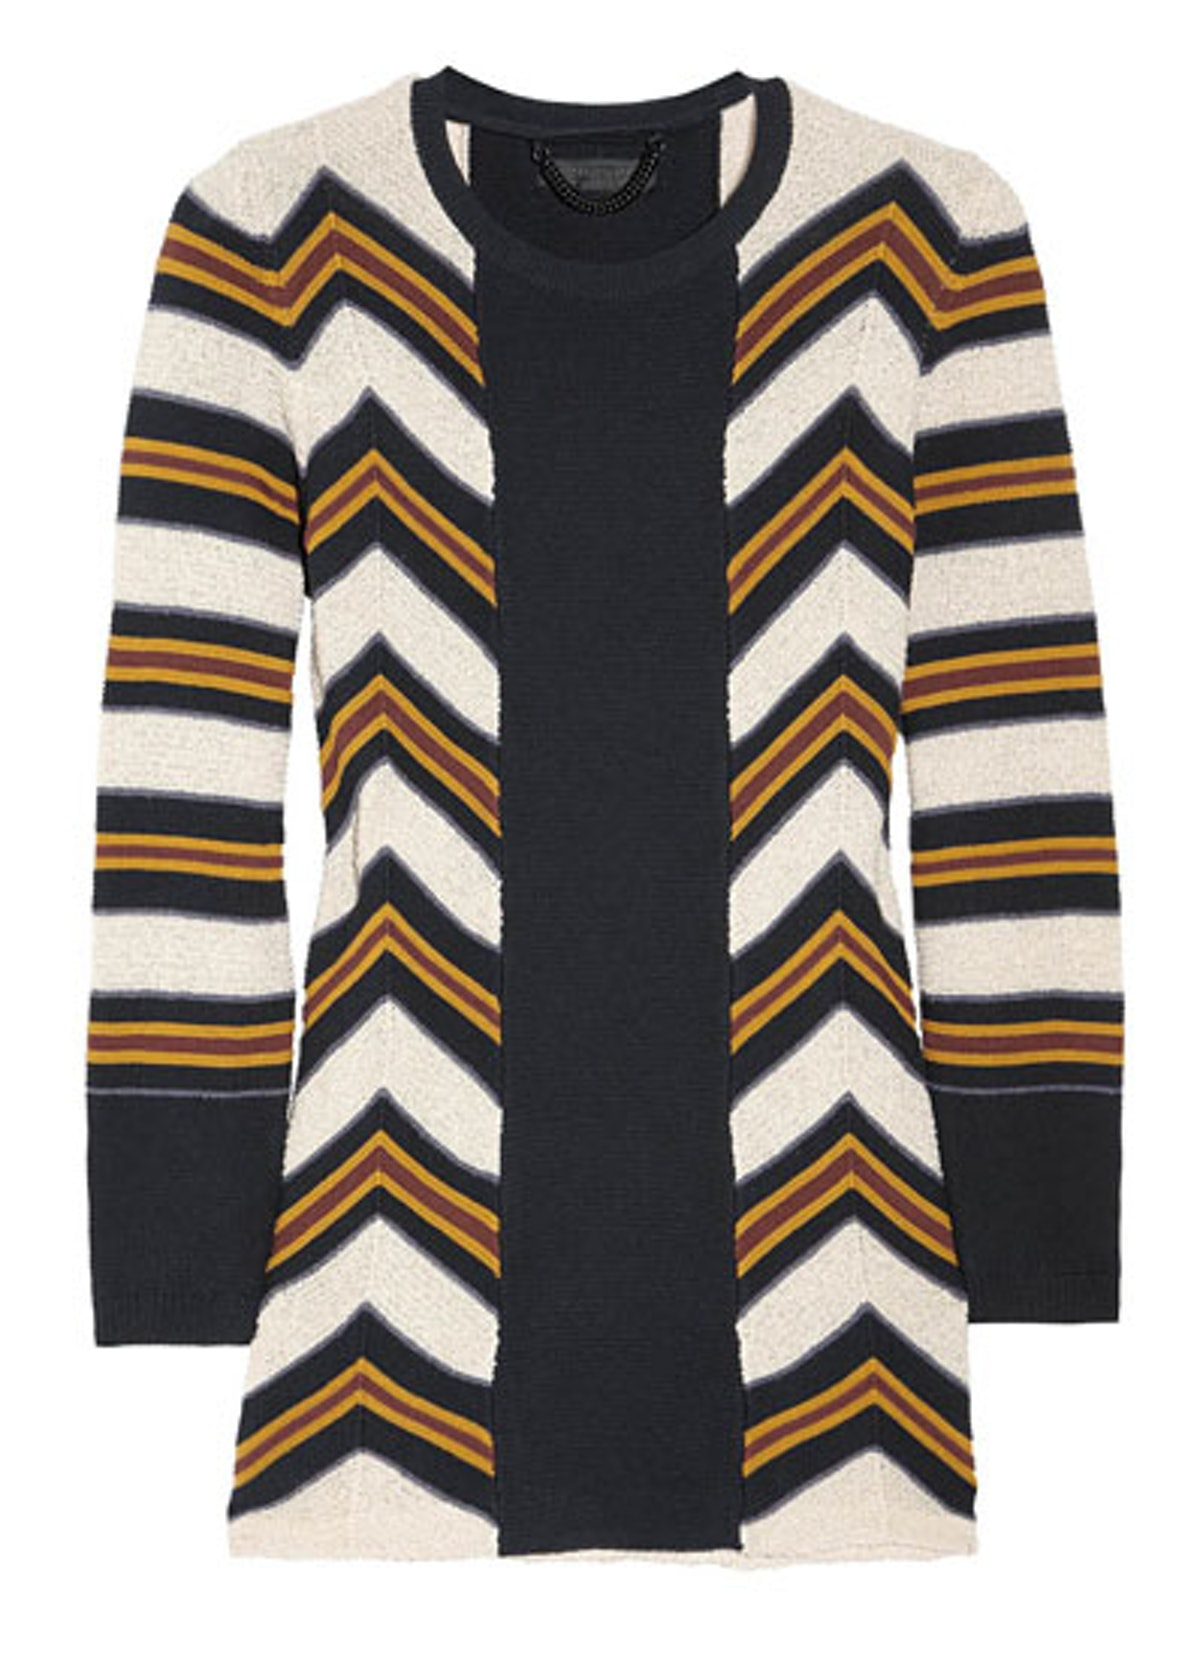 fass-graphic-knits-01-v.jpg